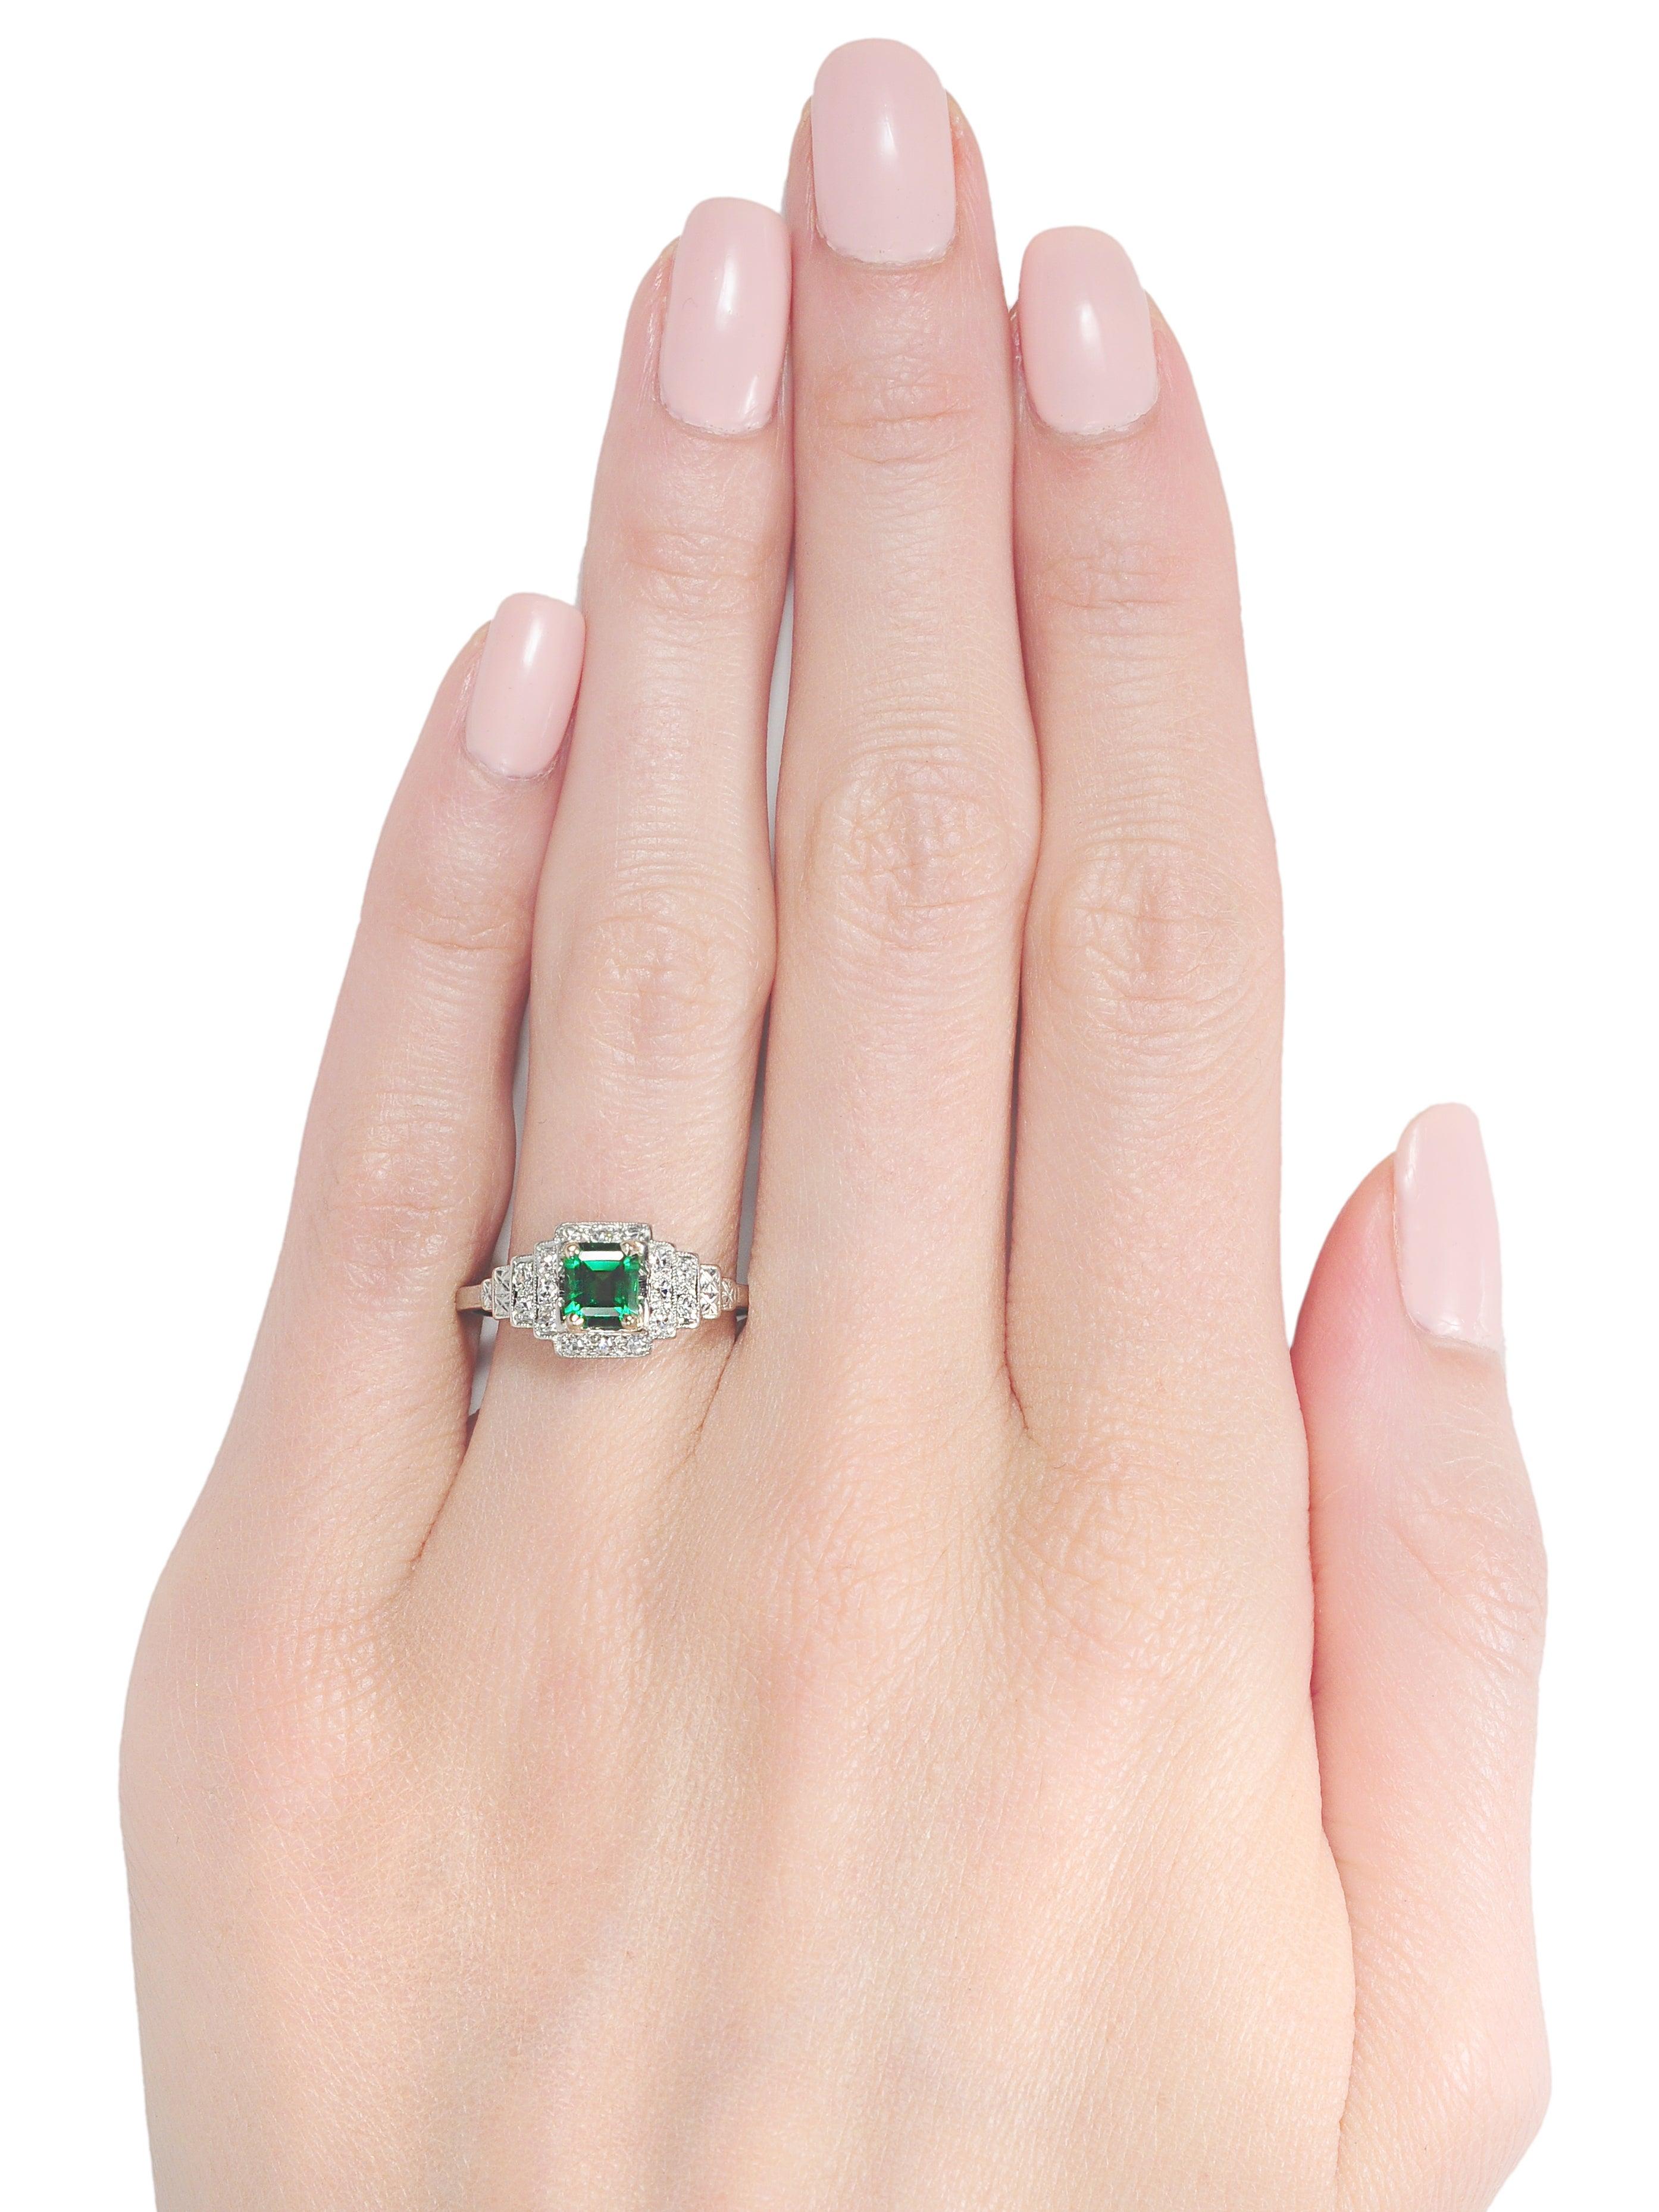 Art Deco Tsavorite Diamond Platinum Ring For Sale at 1stdibs